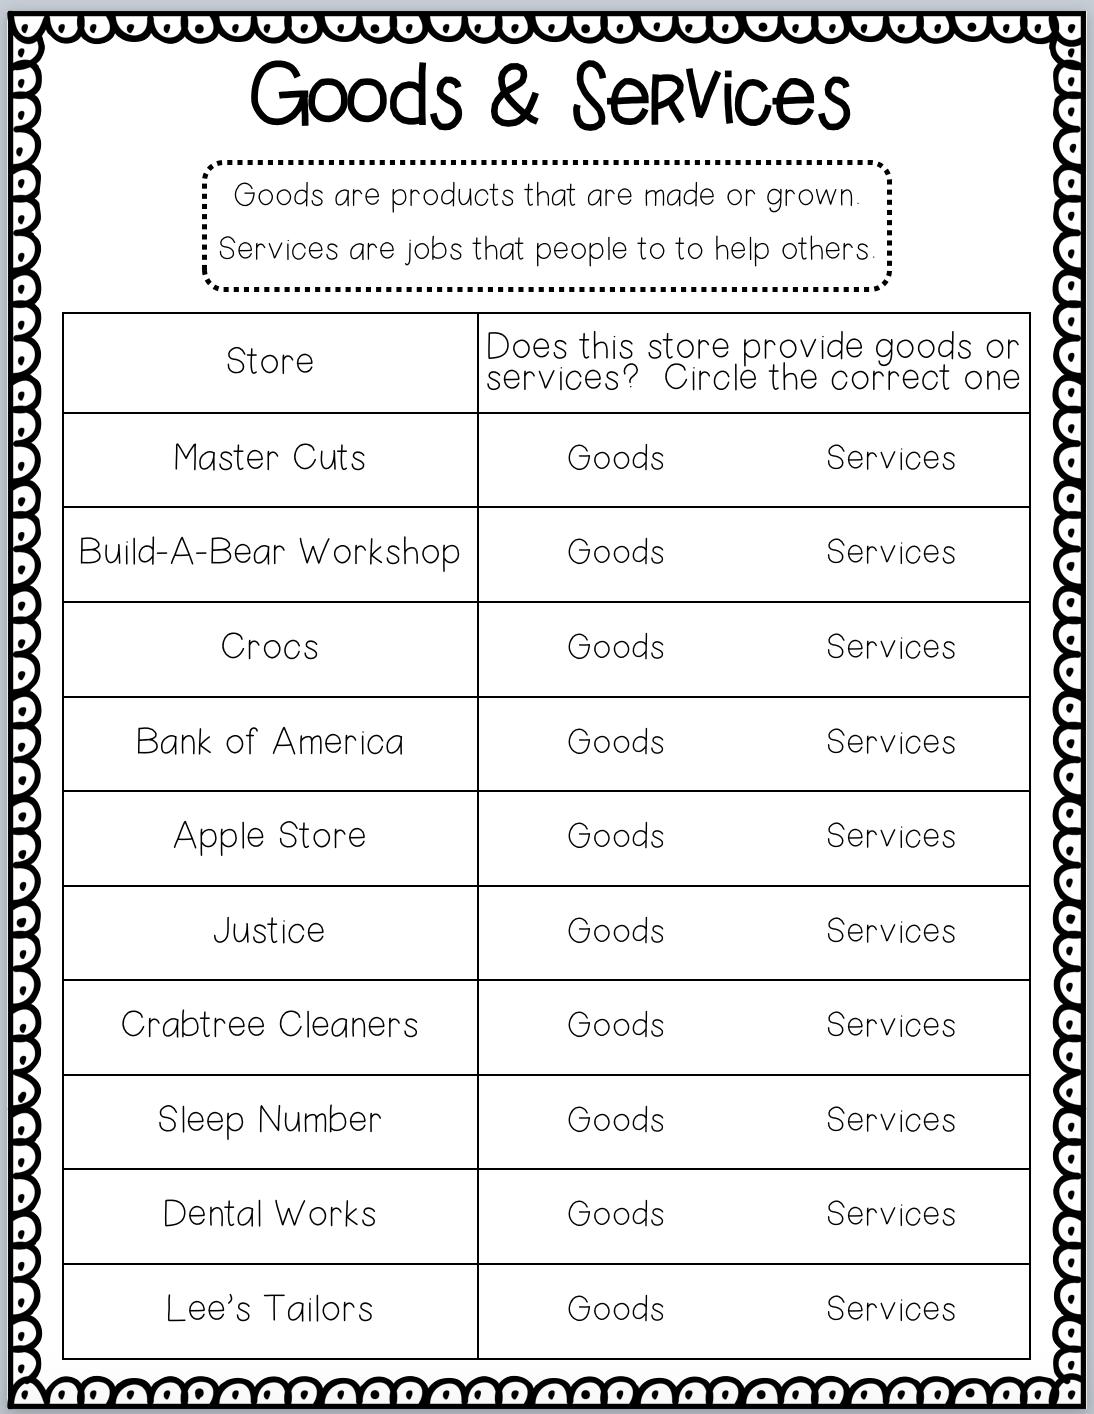 Field Trip Recap Goods And Services 4th Grade Social Studies Field Trip [ 1414 x 1094 Pixel ]